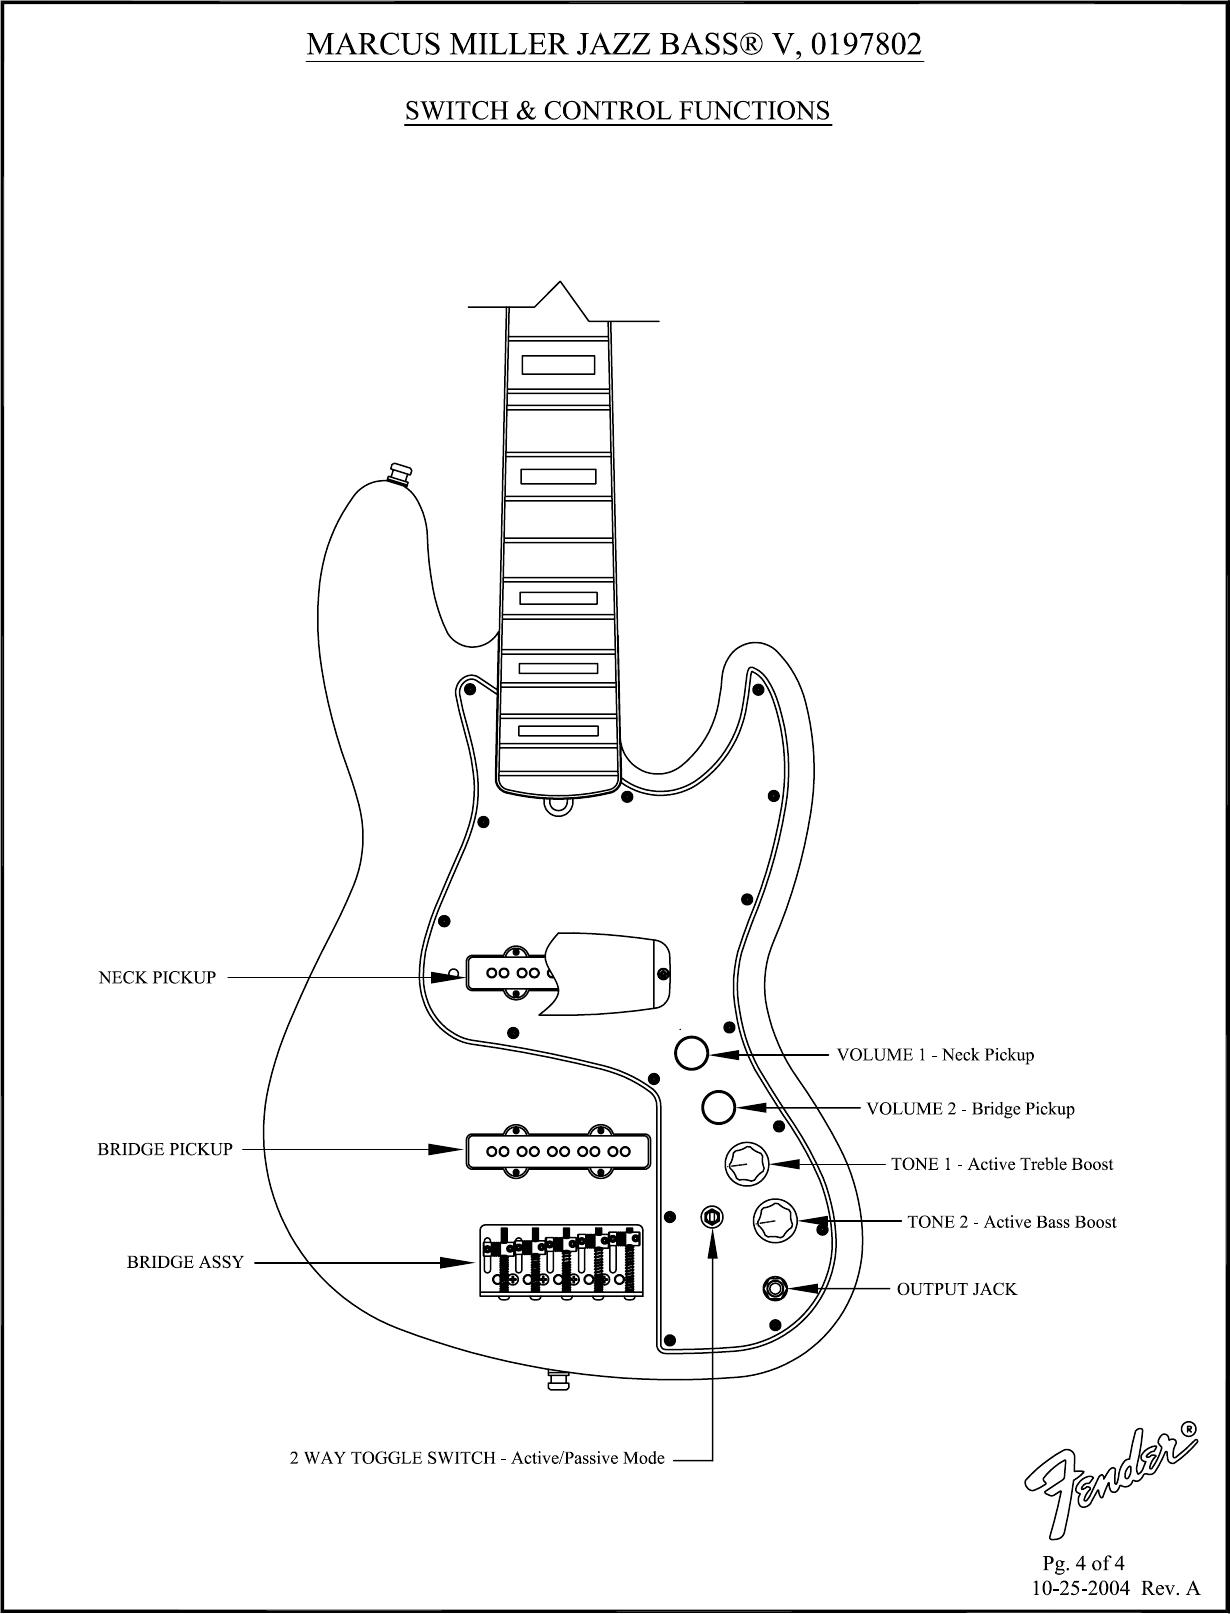 Fender Marcus Miller Jazz Bass Users Manual SD 019 7802 J